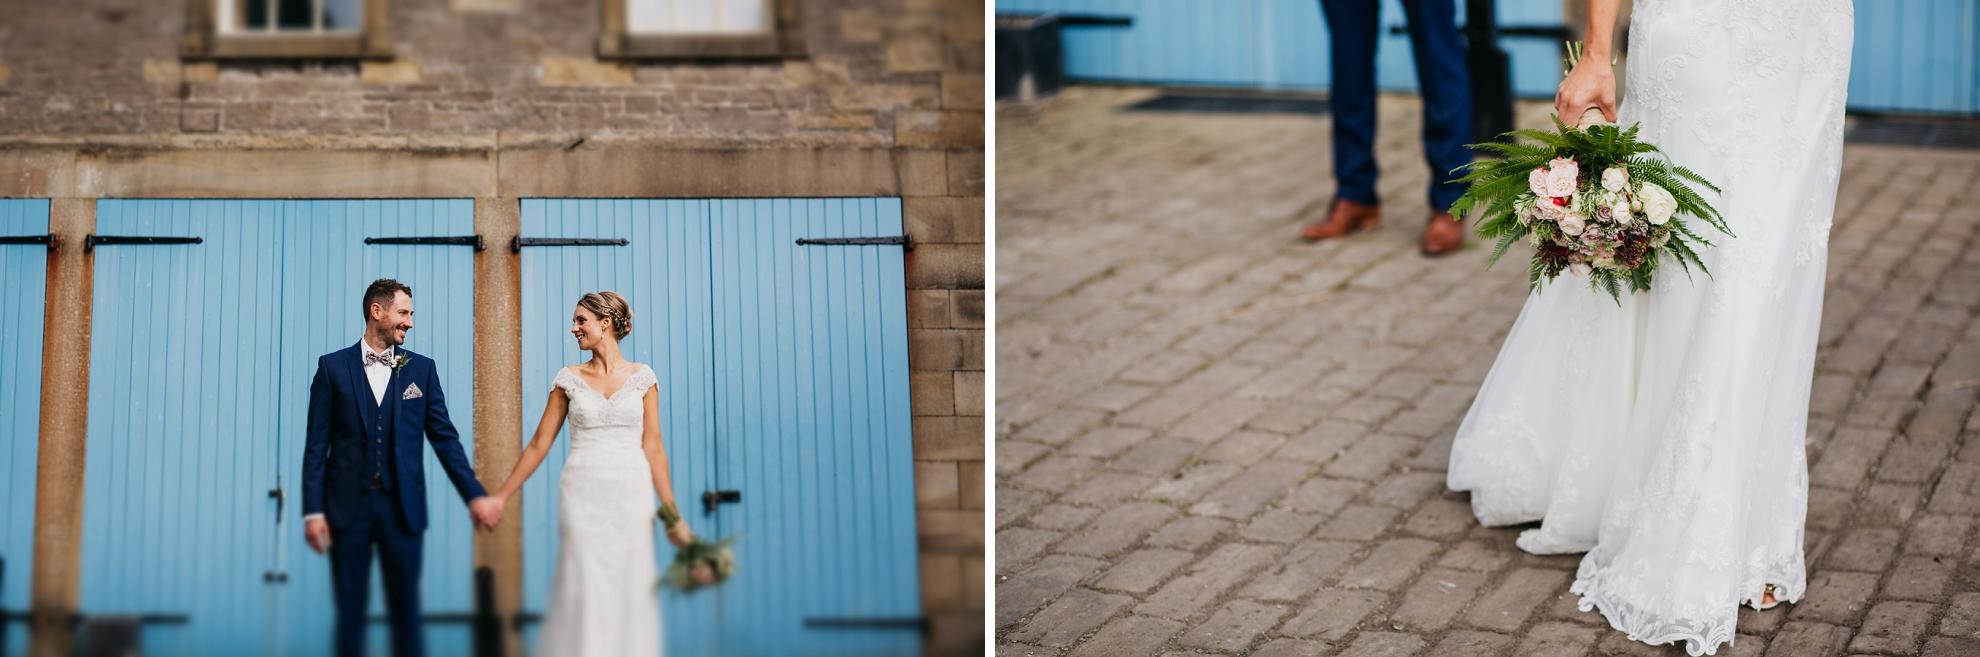 broughton-hall-wedding-photographer_038